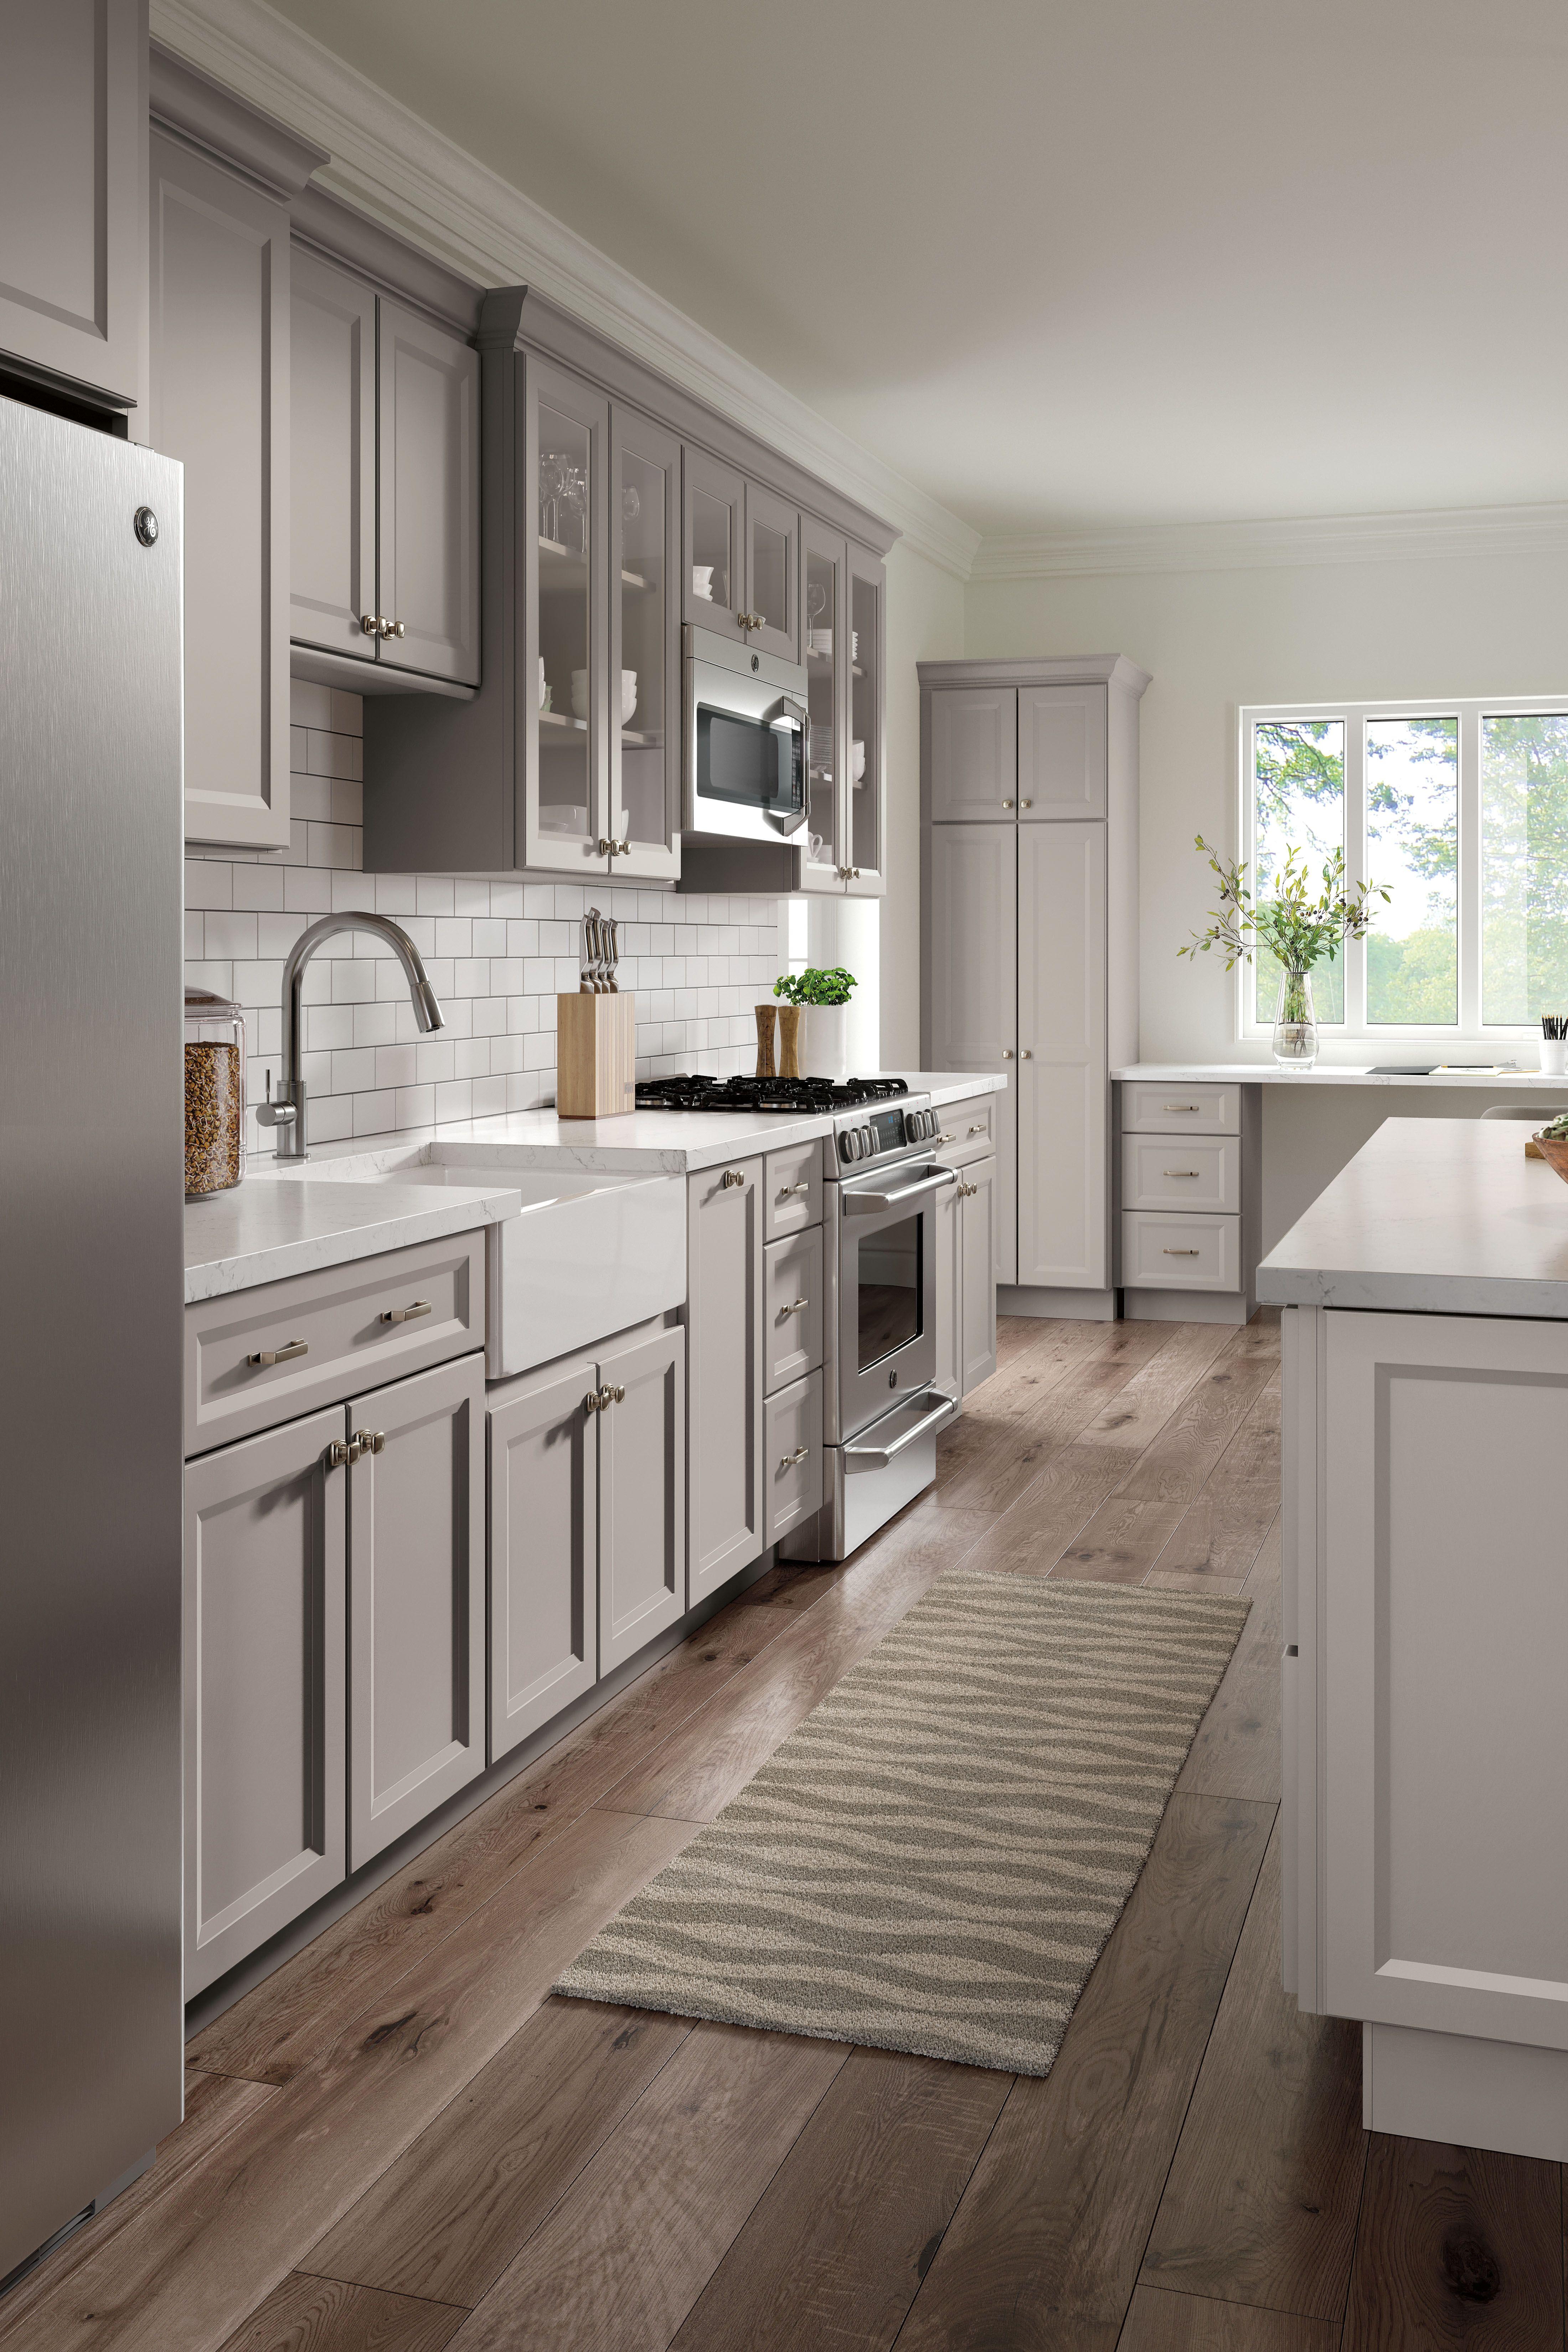 Gray Transitional Kitchen In 2020 Kitchen Remodel Small Kitchen Design Diy Kitchen Cabinets